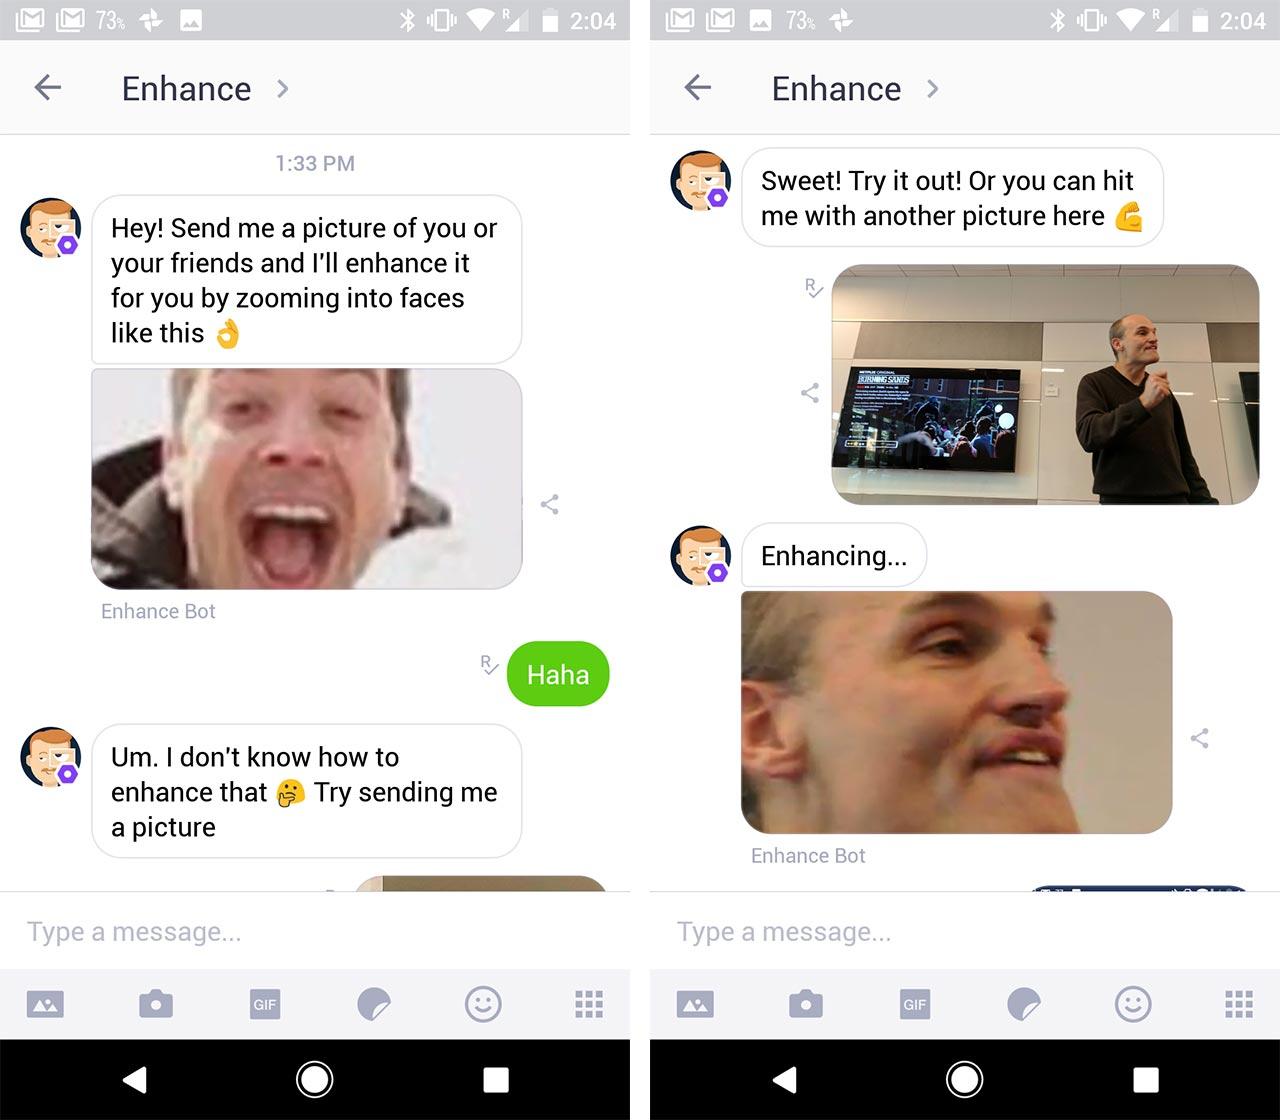 enhance on kik - bot screenshots